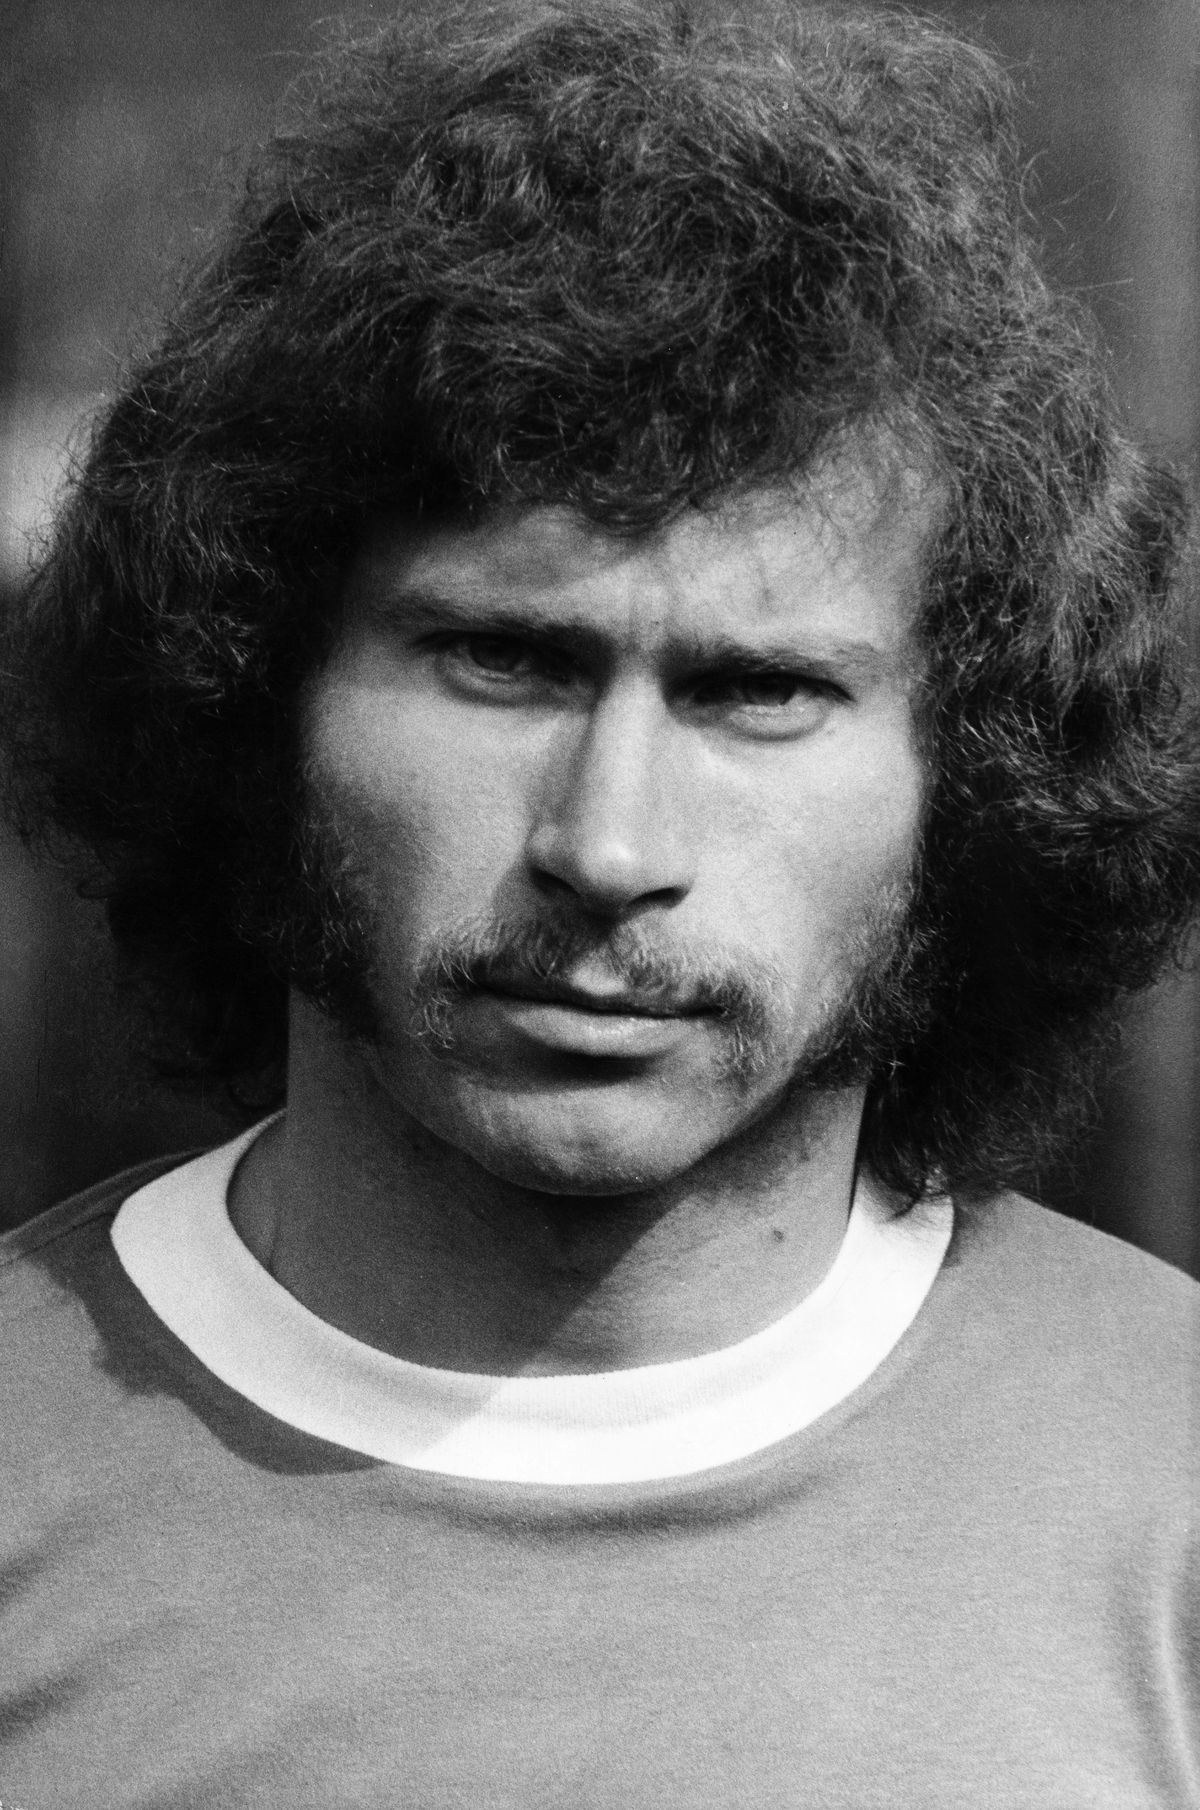 (GERMANY OUT) Breitner, Paul *05.09.1951- Fussballspieler, D Nationalspieler, Weltmeister 1974 - Portrait - 1974